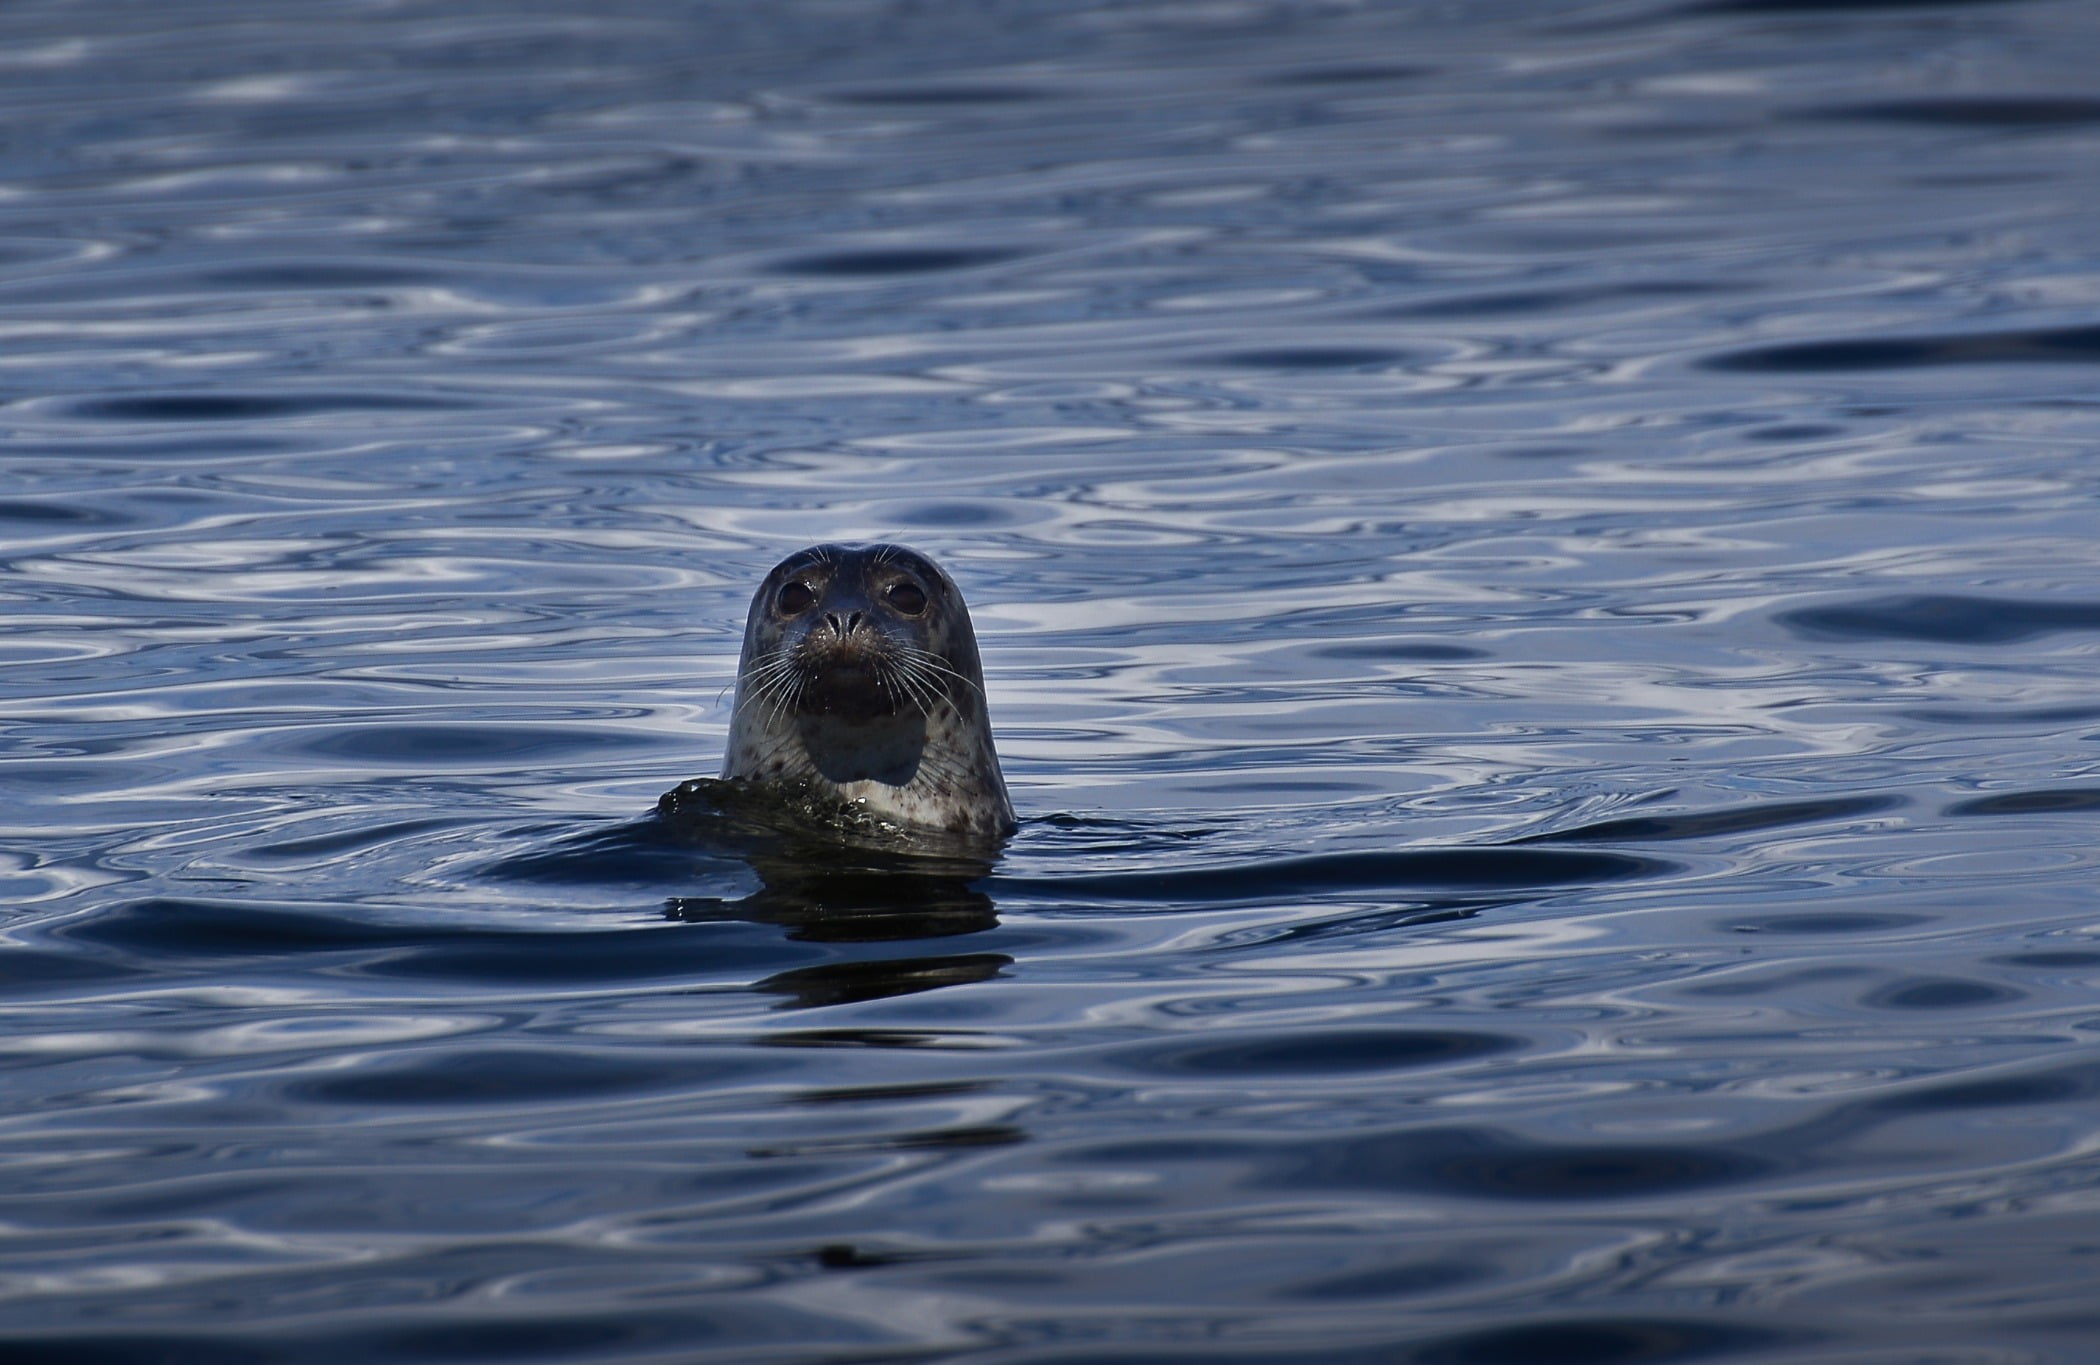 Water, Liquid, Fluid, Carnivore, Otter, Lake